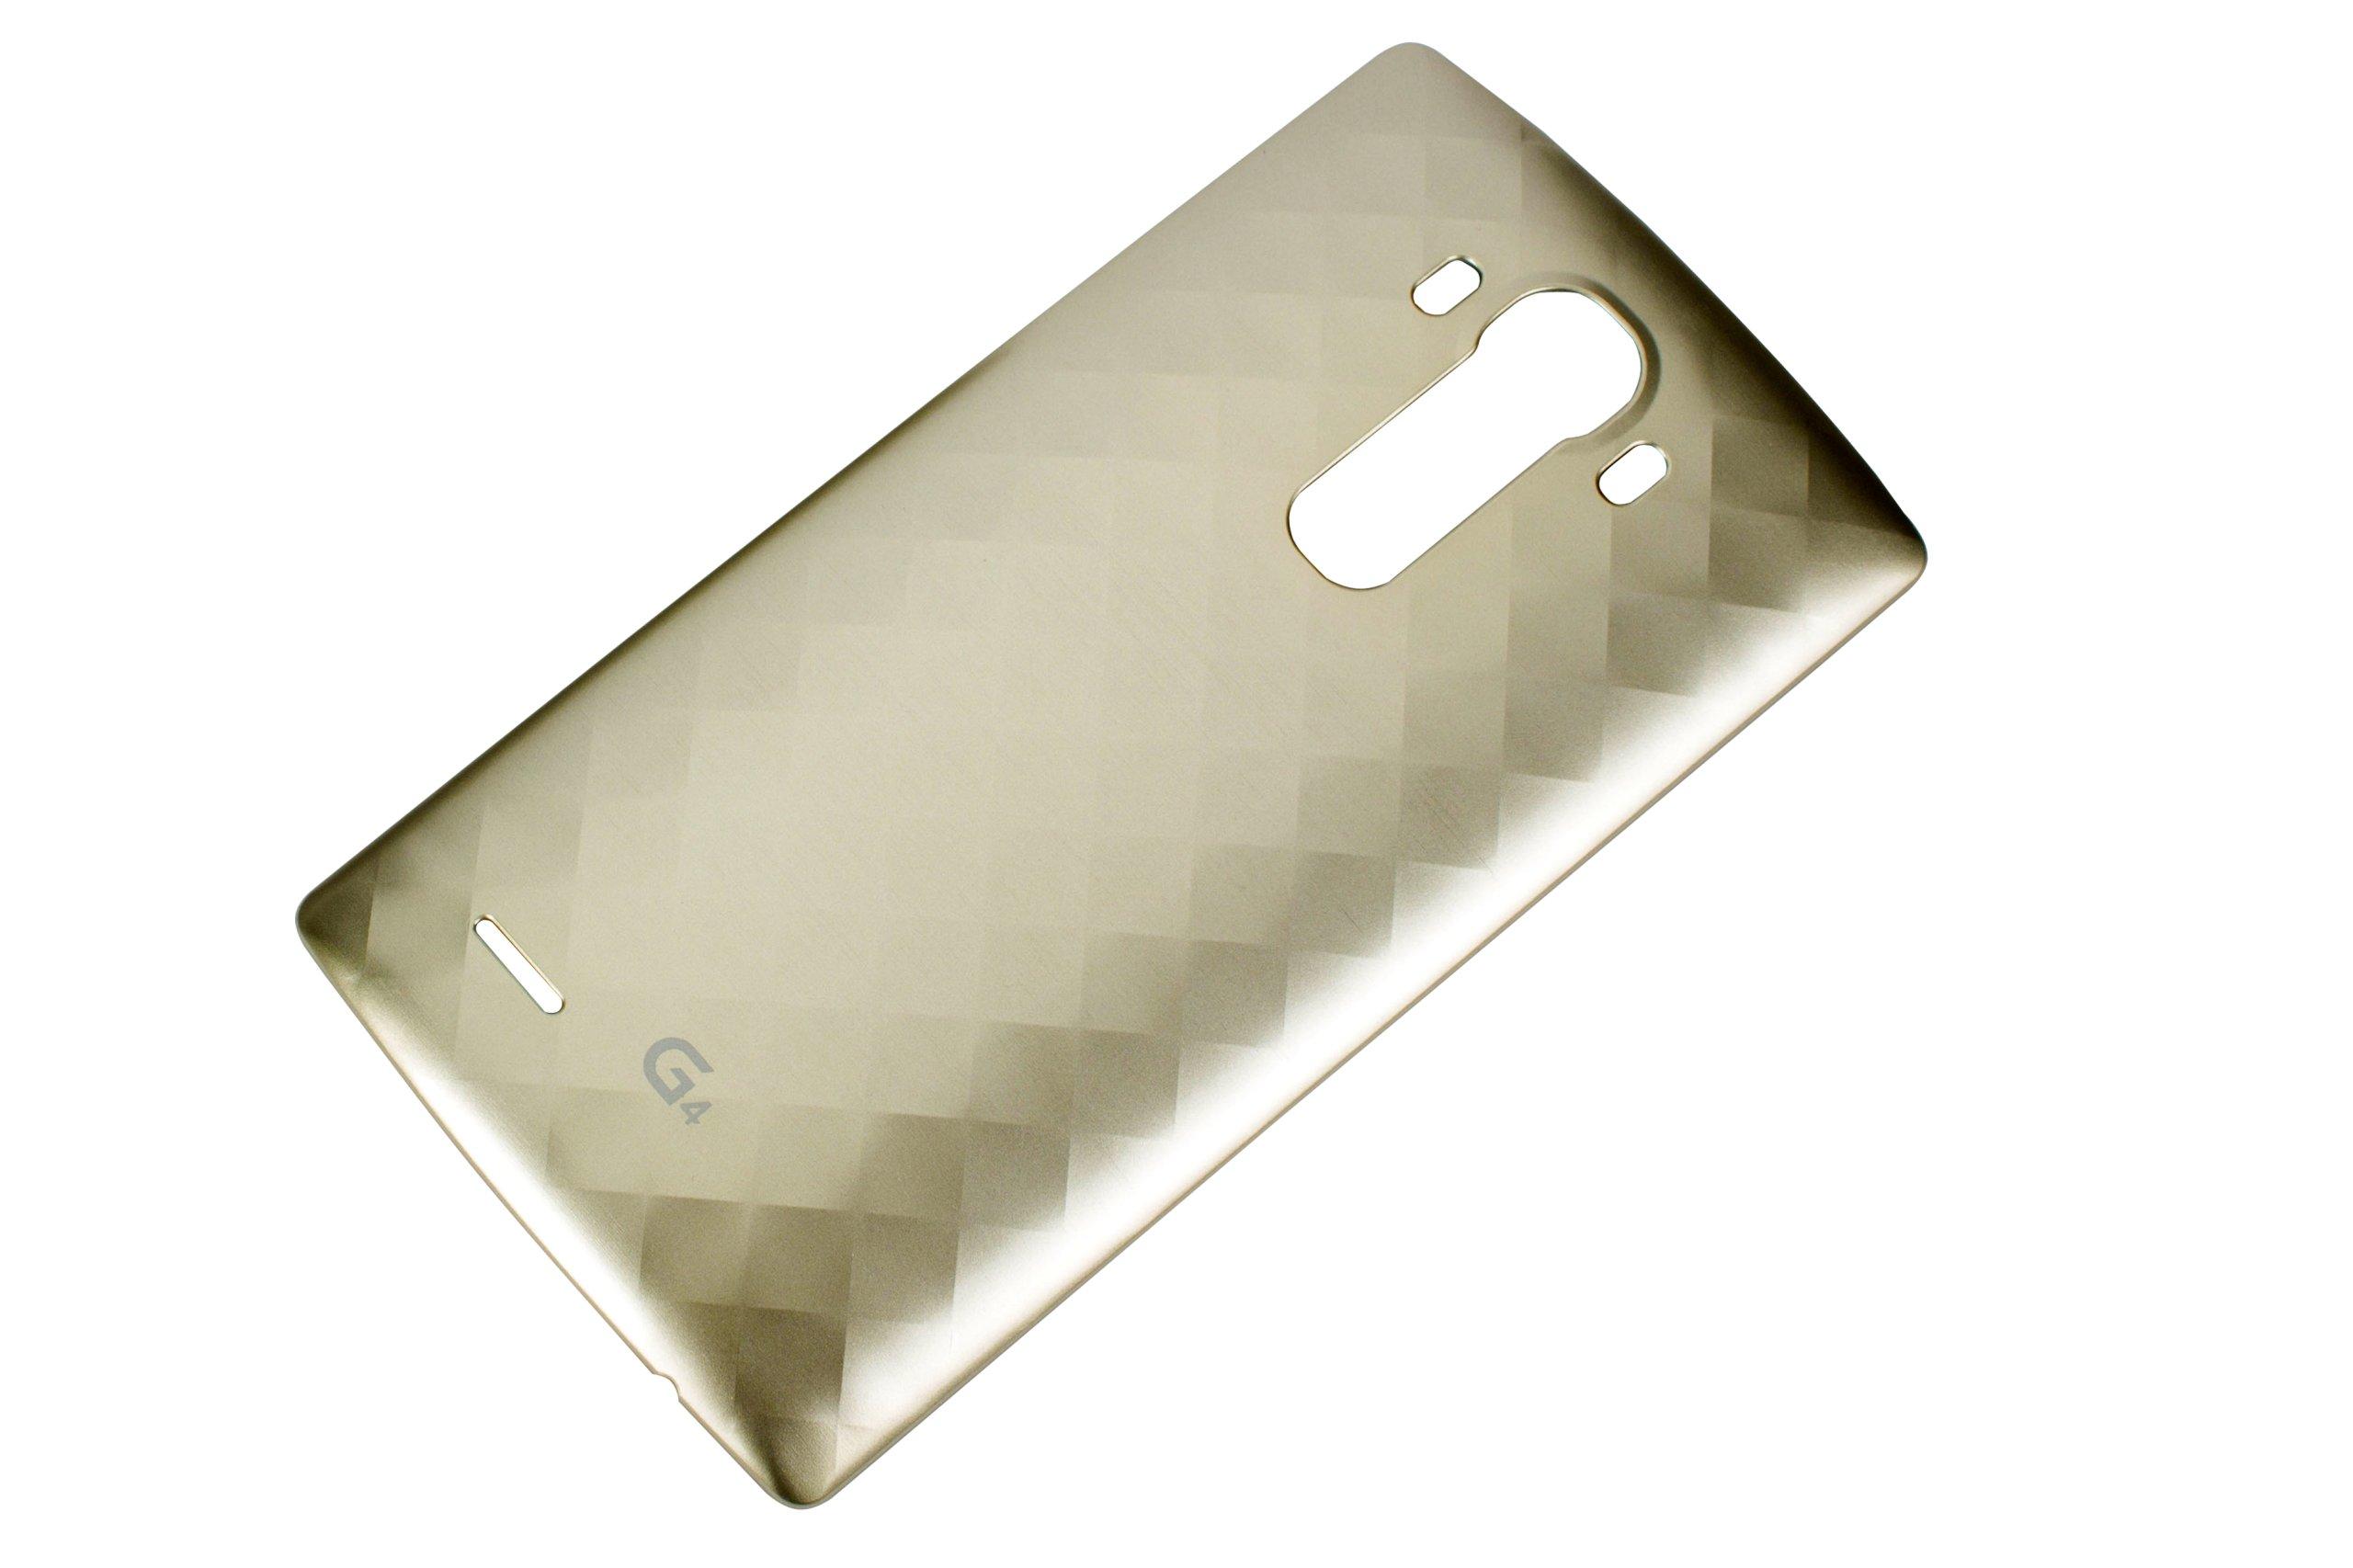 LG G4 H815 H818 OBUDOWA TYLNA KLAPKA BATERII